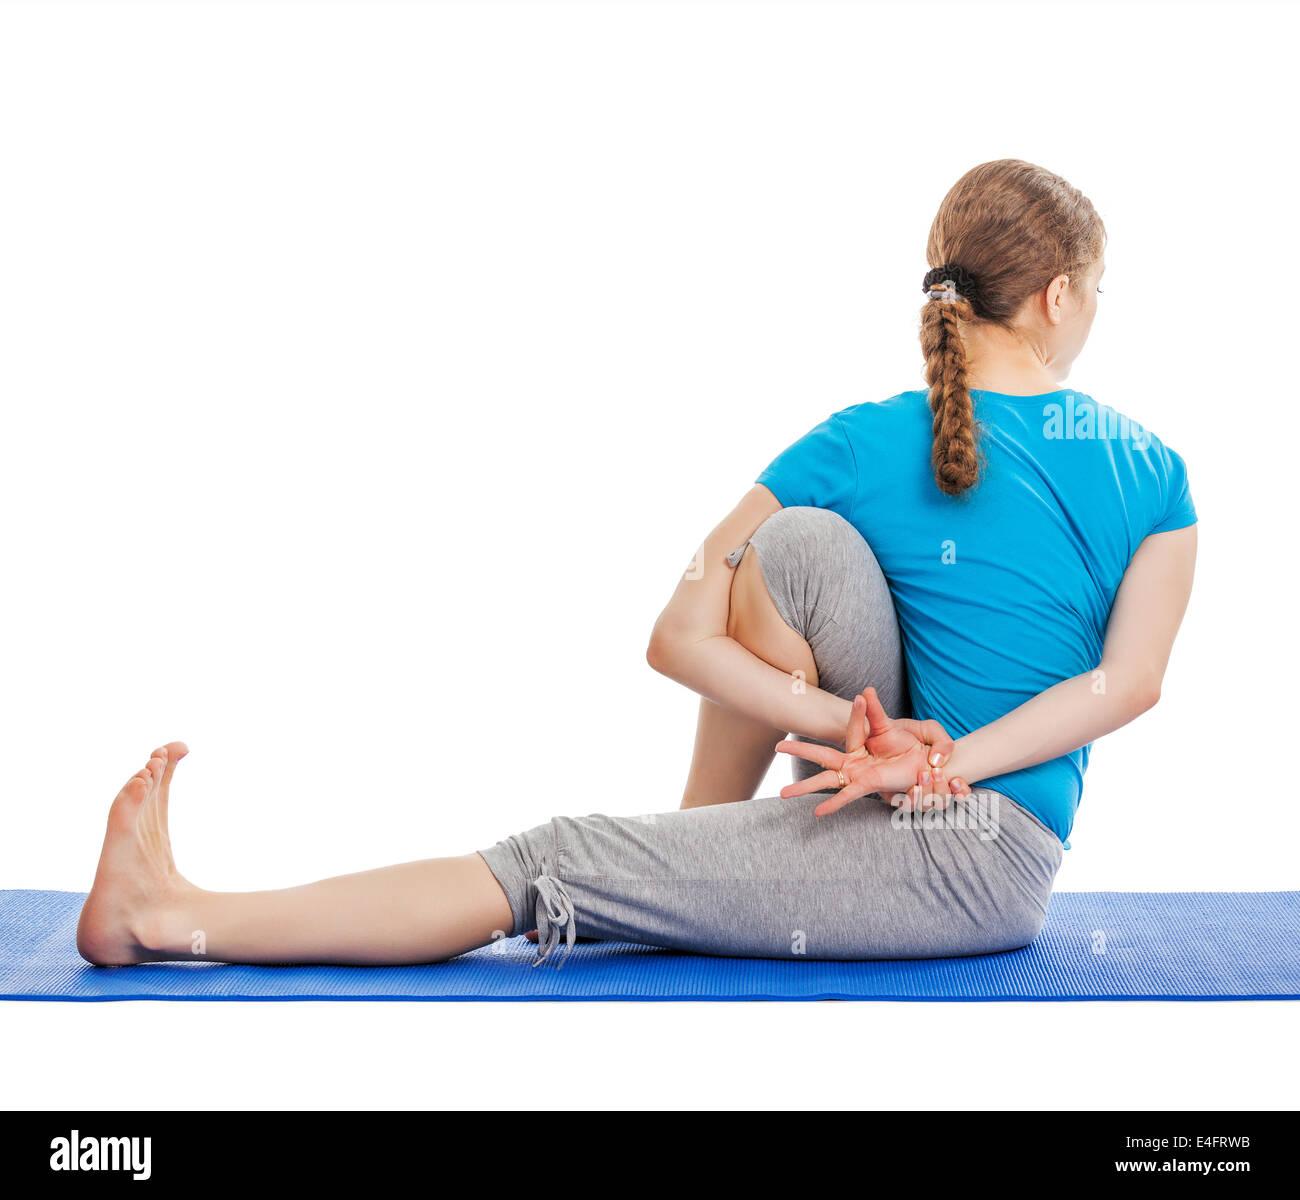 Yoga - belle jeune femme svelte professeur de yoga faisant l'Sage Twist C poser (Marichyasana C) exercice d'asanas Photo Stock